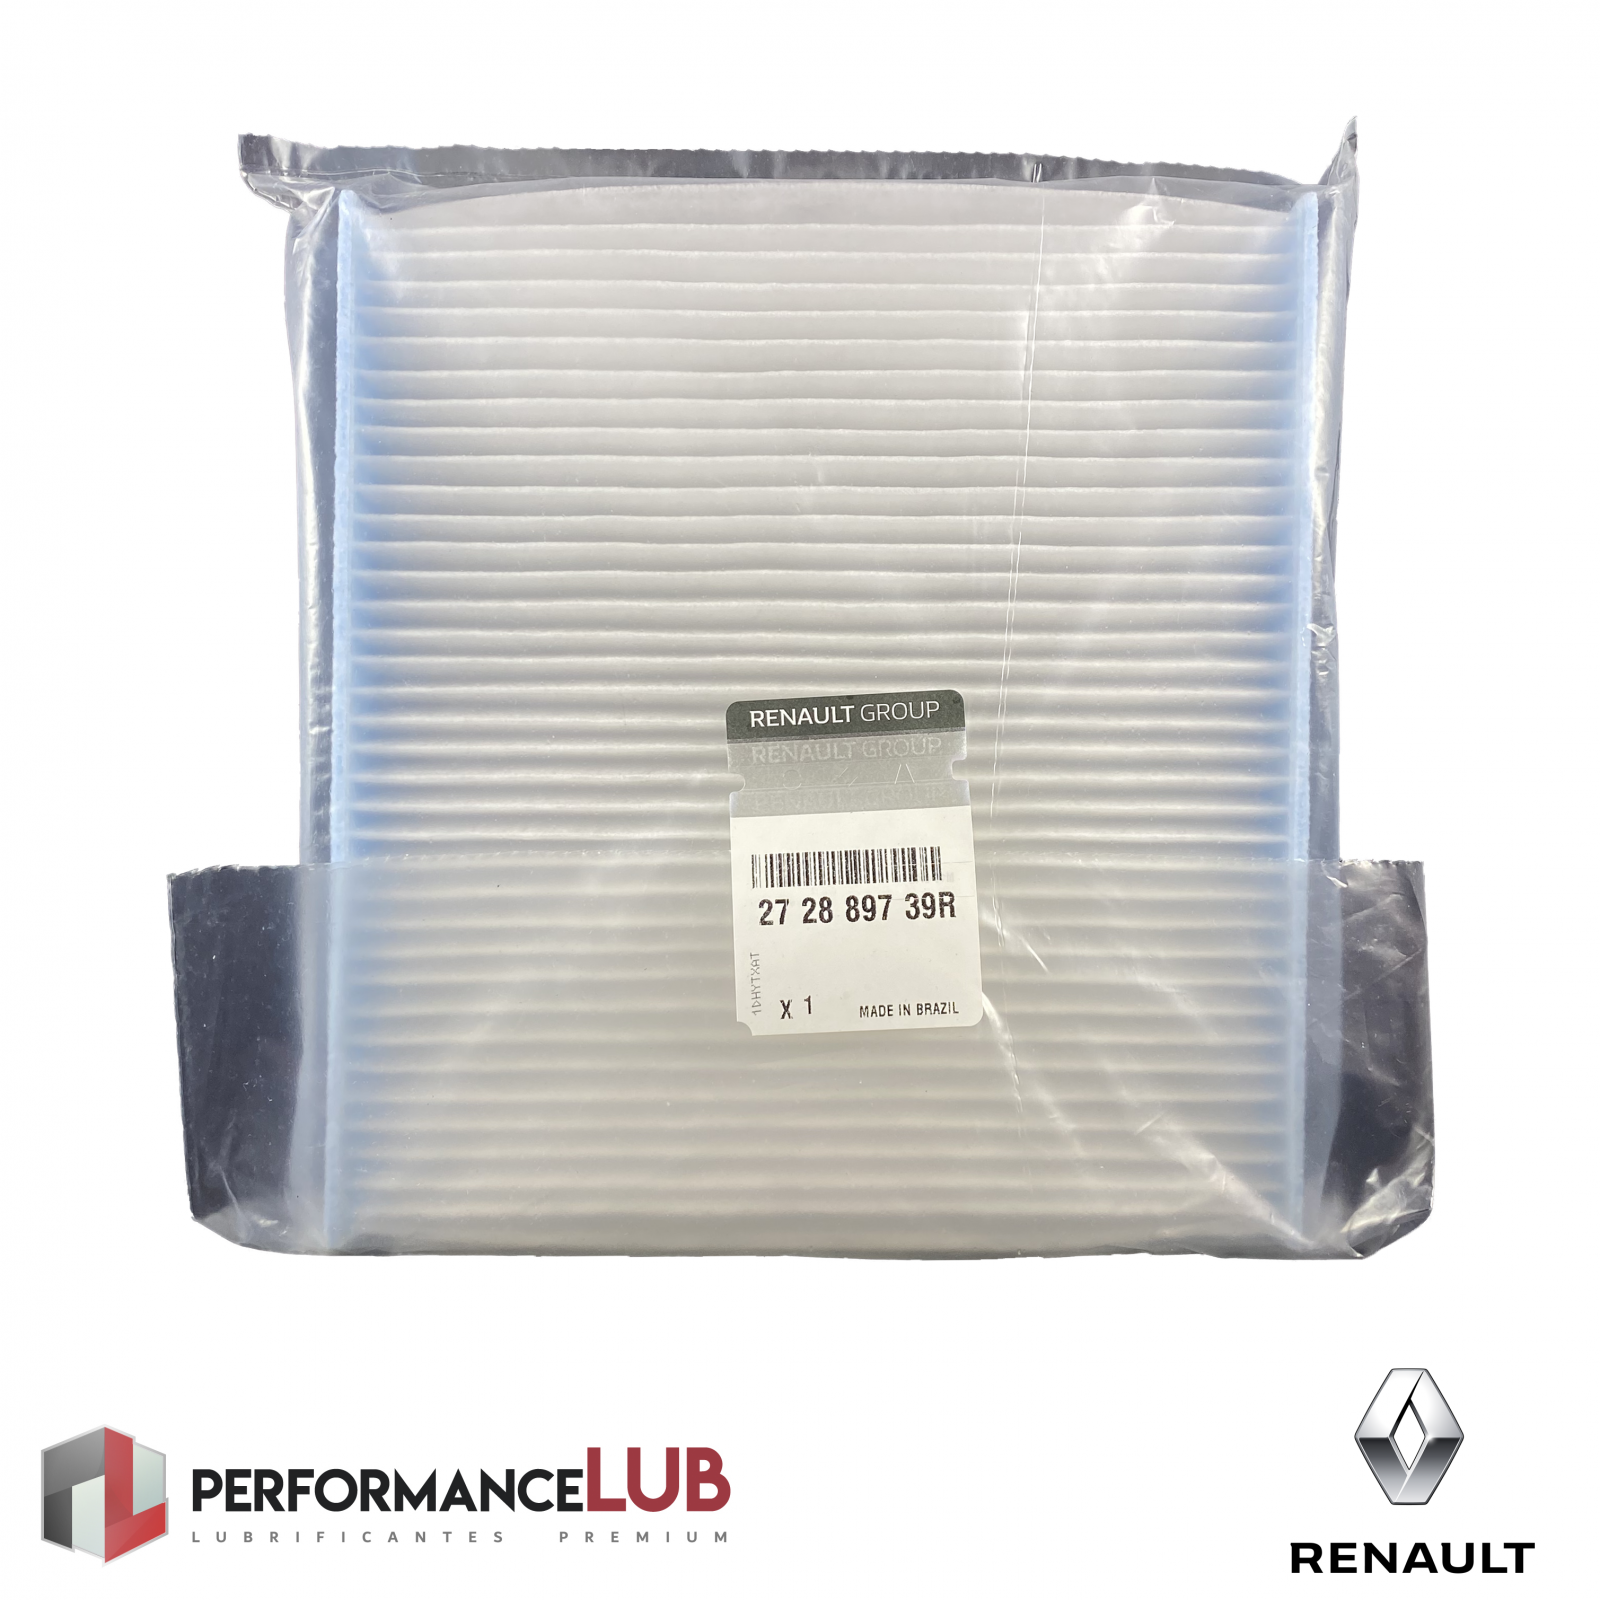 Filtro de ar da cabine - Renault Sandero/Logan (fase 2) - 27 28 897 39R - PerformanceLUB Lubrificantes Premium